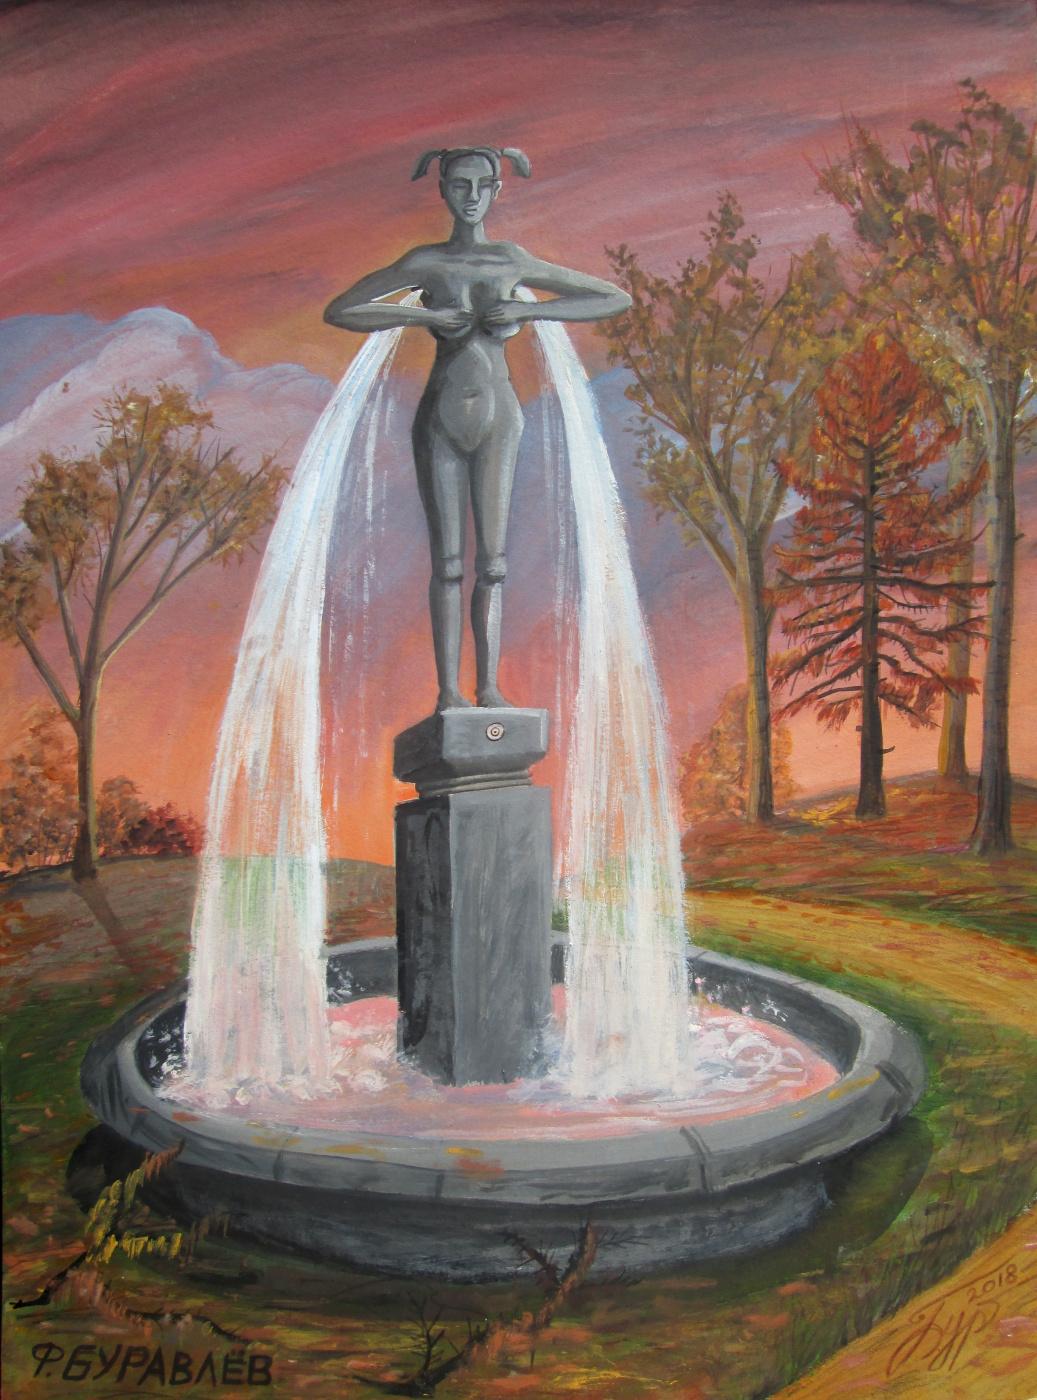 Фёдор Михайлович Буравлёв. Fountain Monument Deodorant